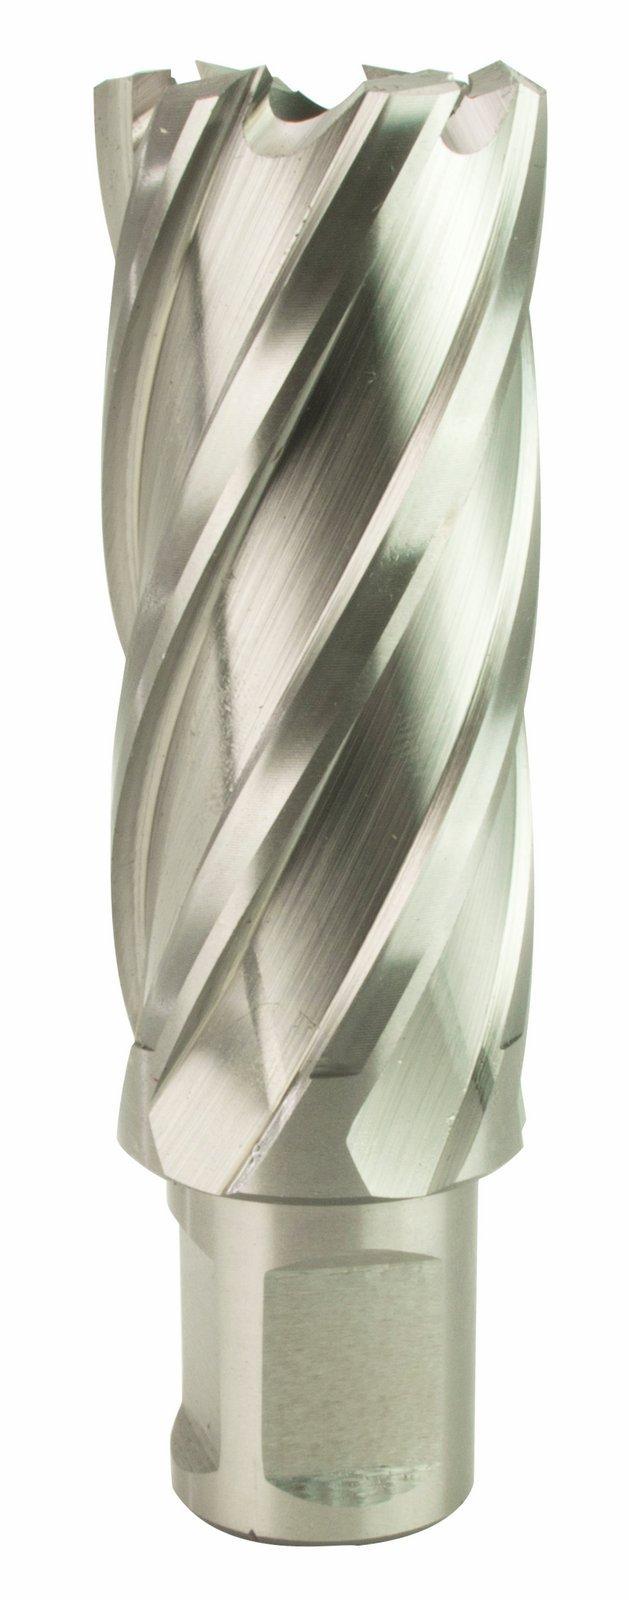 Steel Dragon Tools 1'' x 2'' High Speed Steel Annular Cutter with 3/4'' Weldon Shank